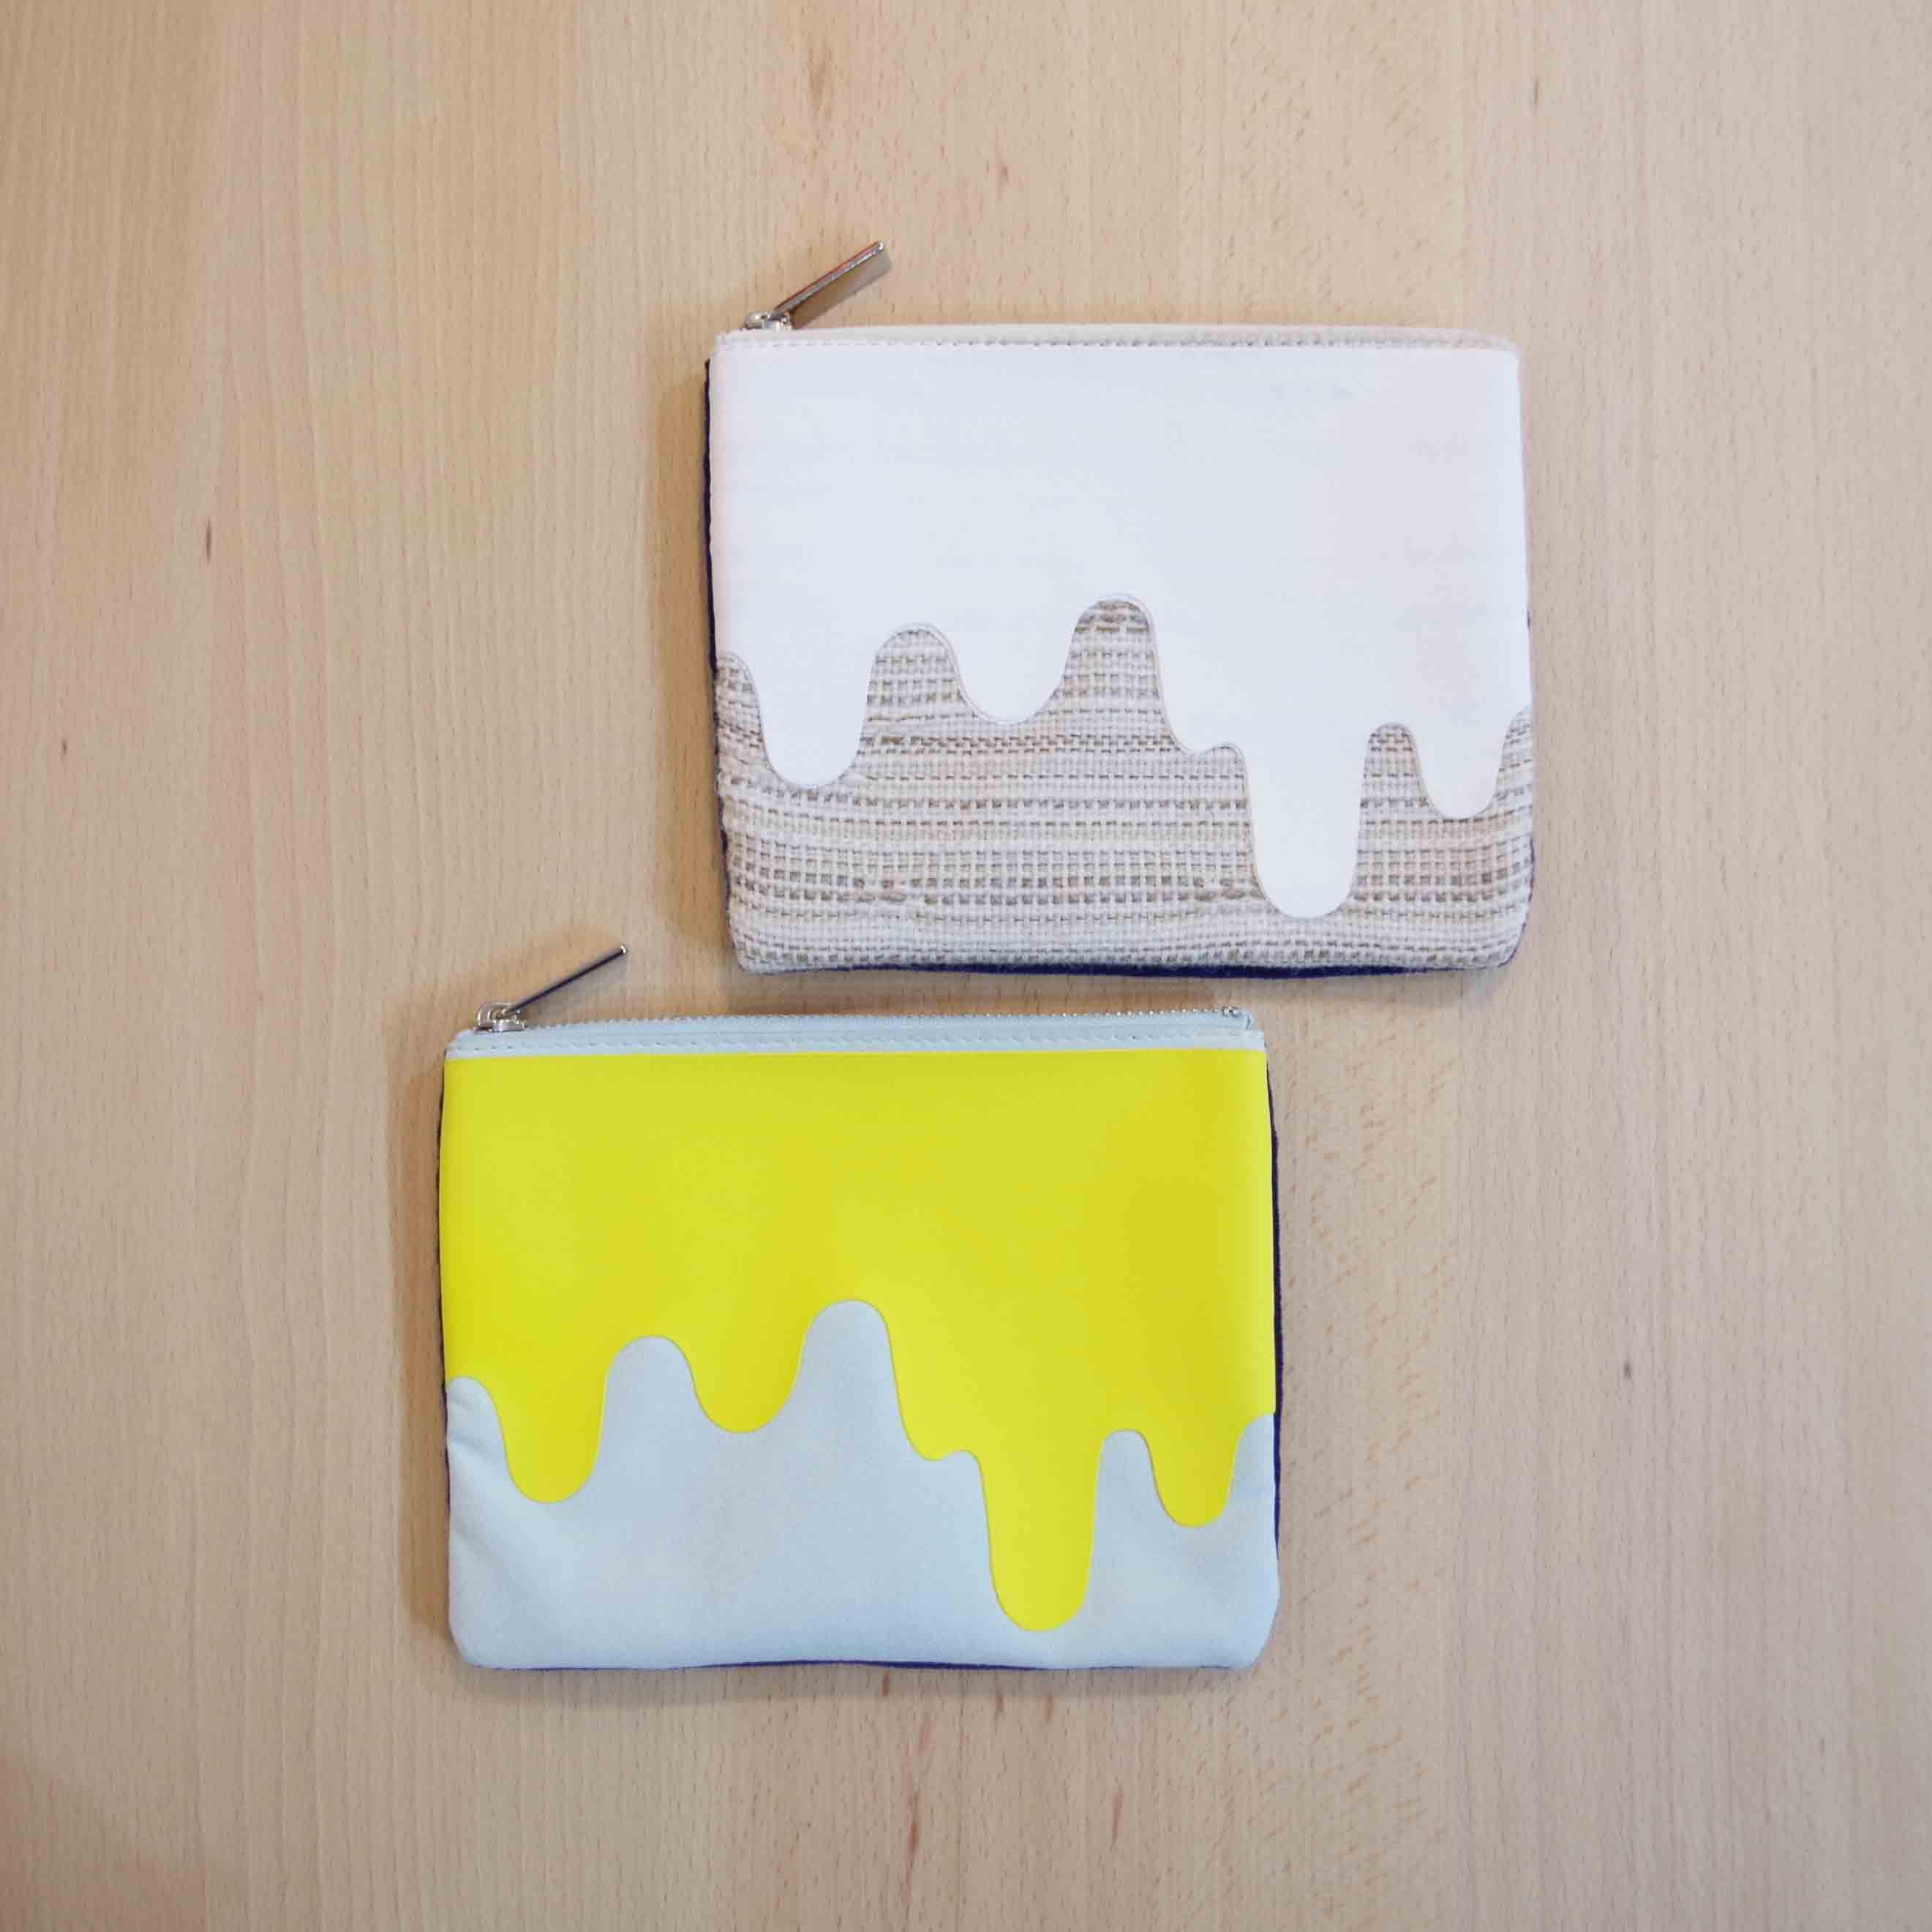 【desertic × Knoll】Liquid Print Poach -Knoll Textiles- Mサイズ